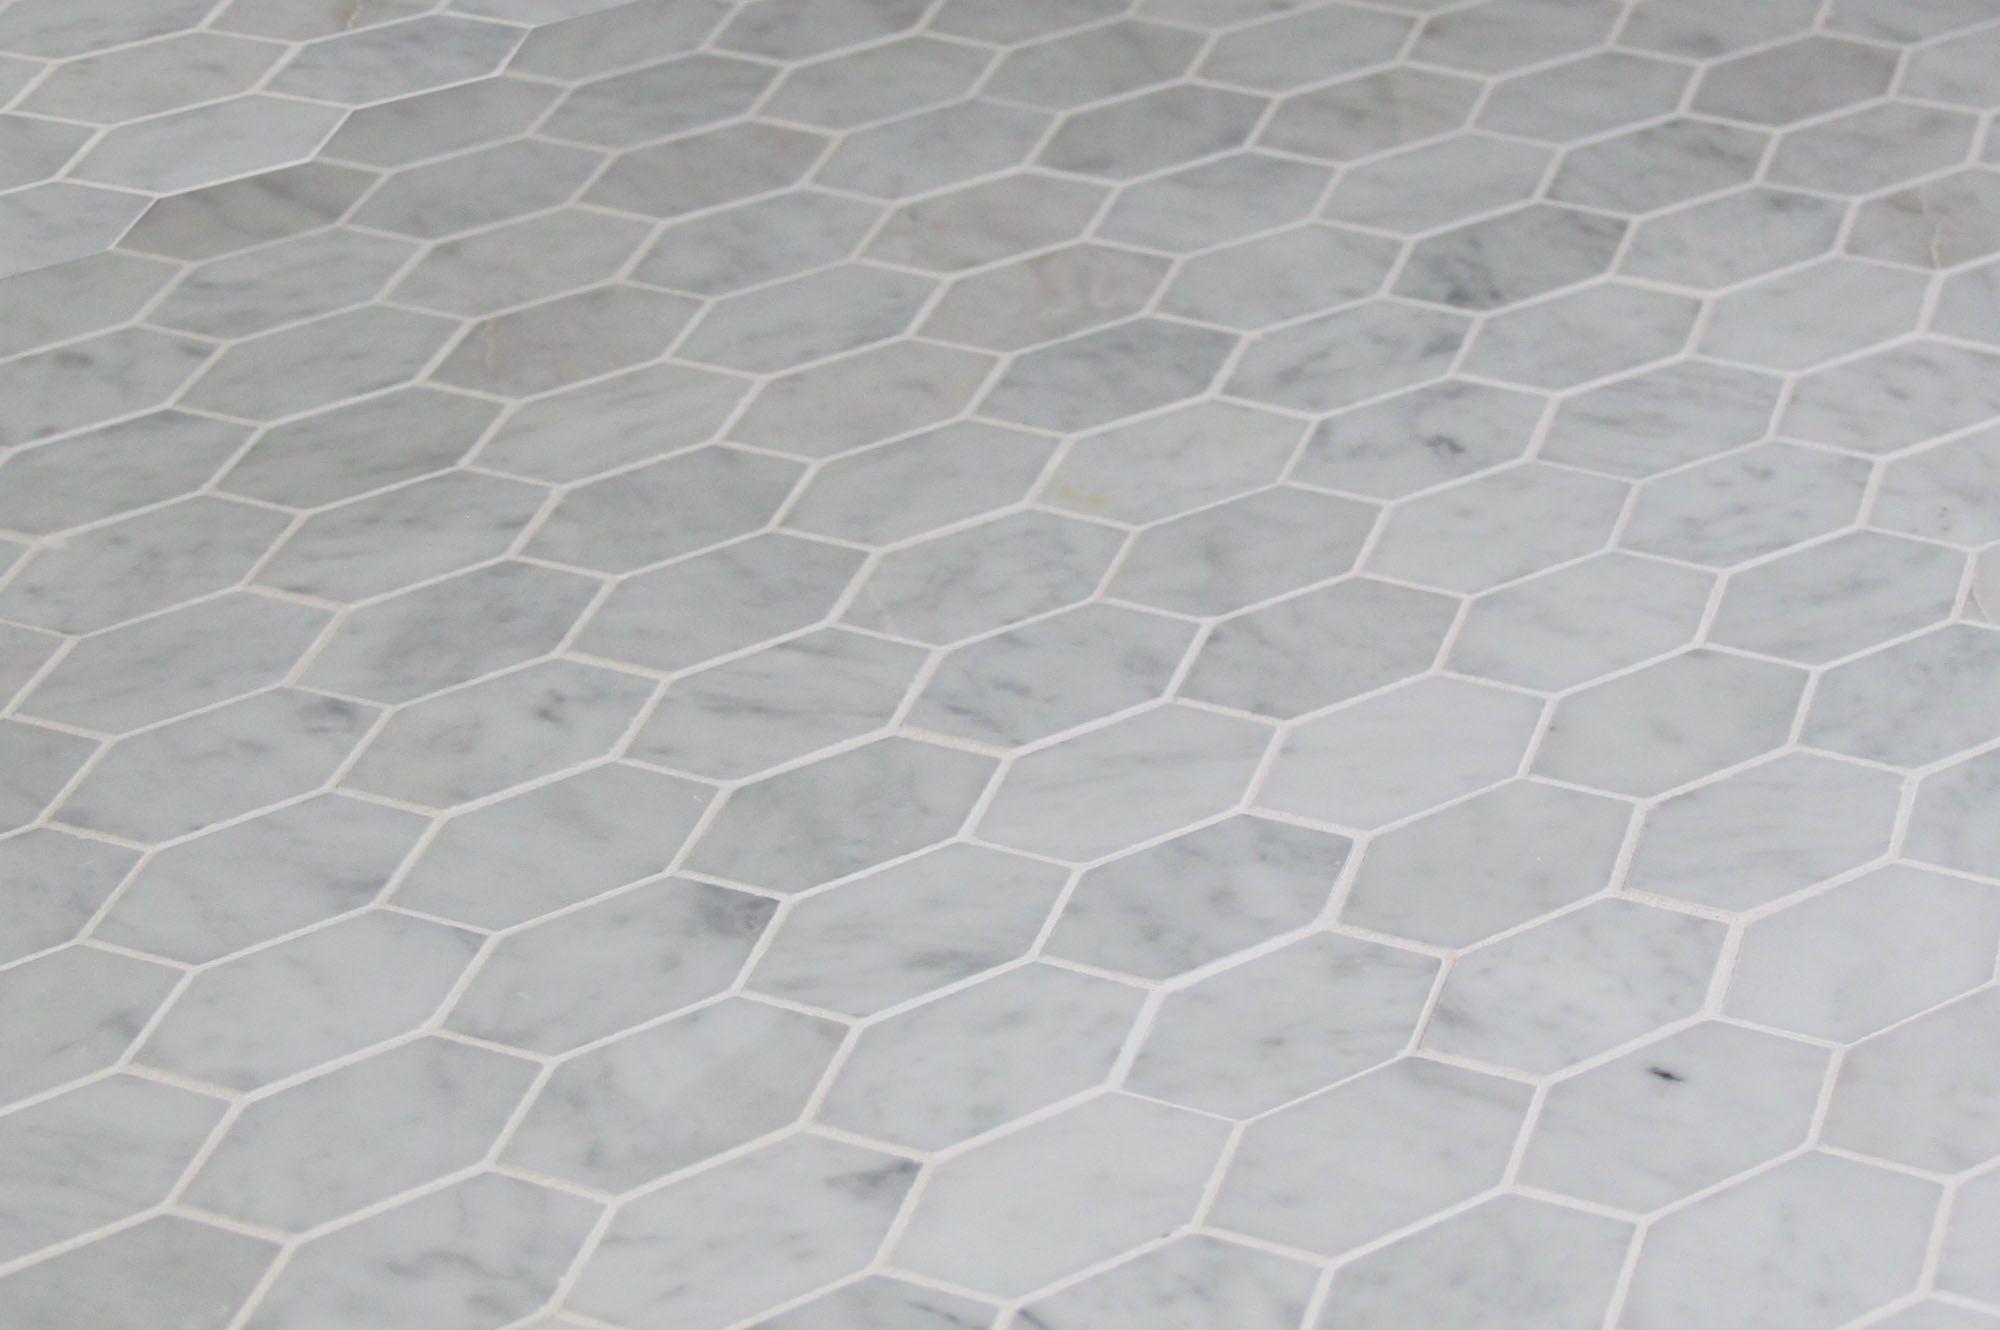 Honeycomb Floor Tile Gooddesign